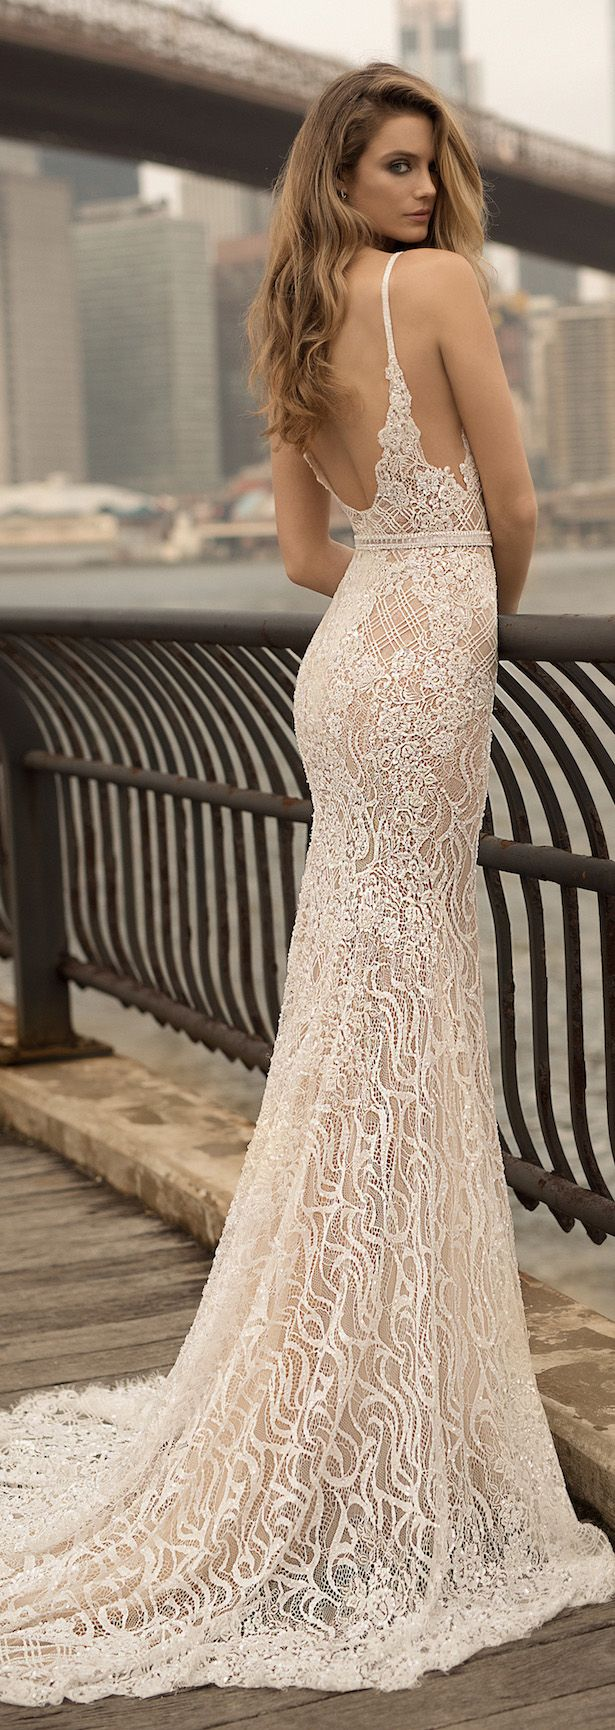 Berta Wedding Dress Collection Spring 2018   BODAS   Pinterest ...